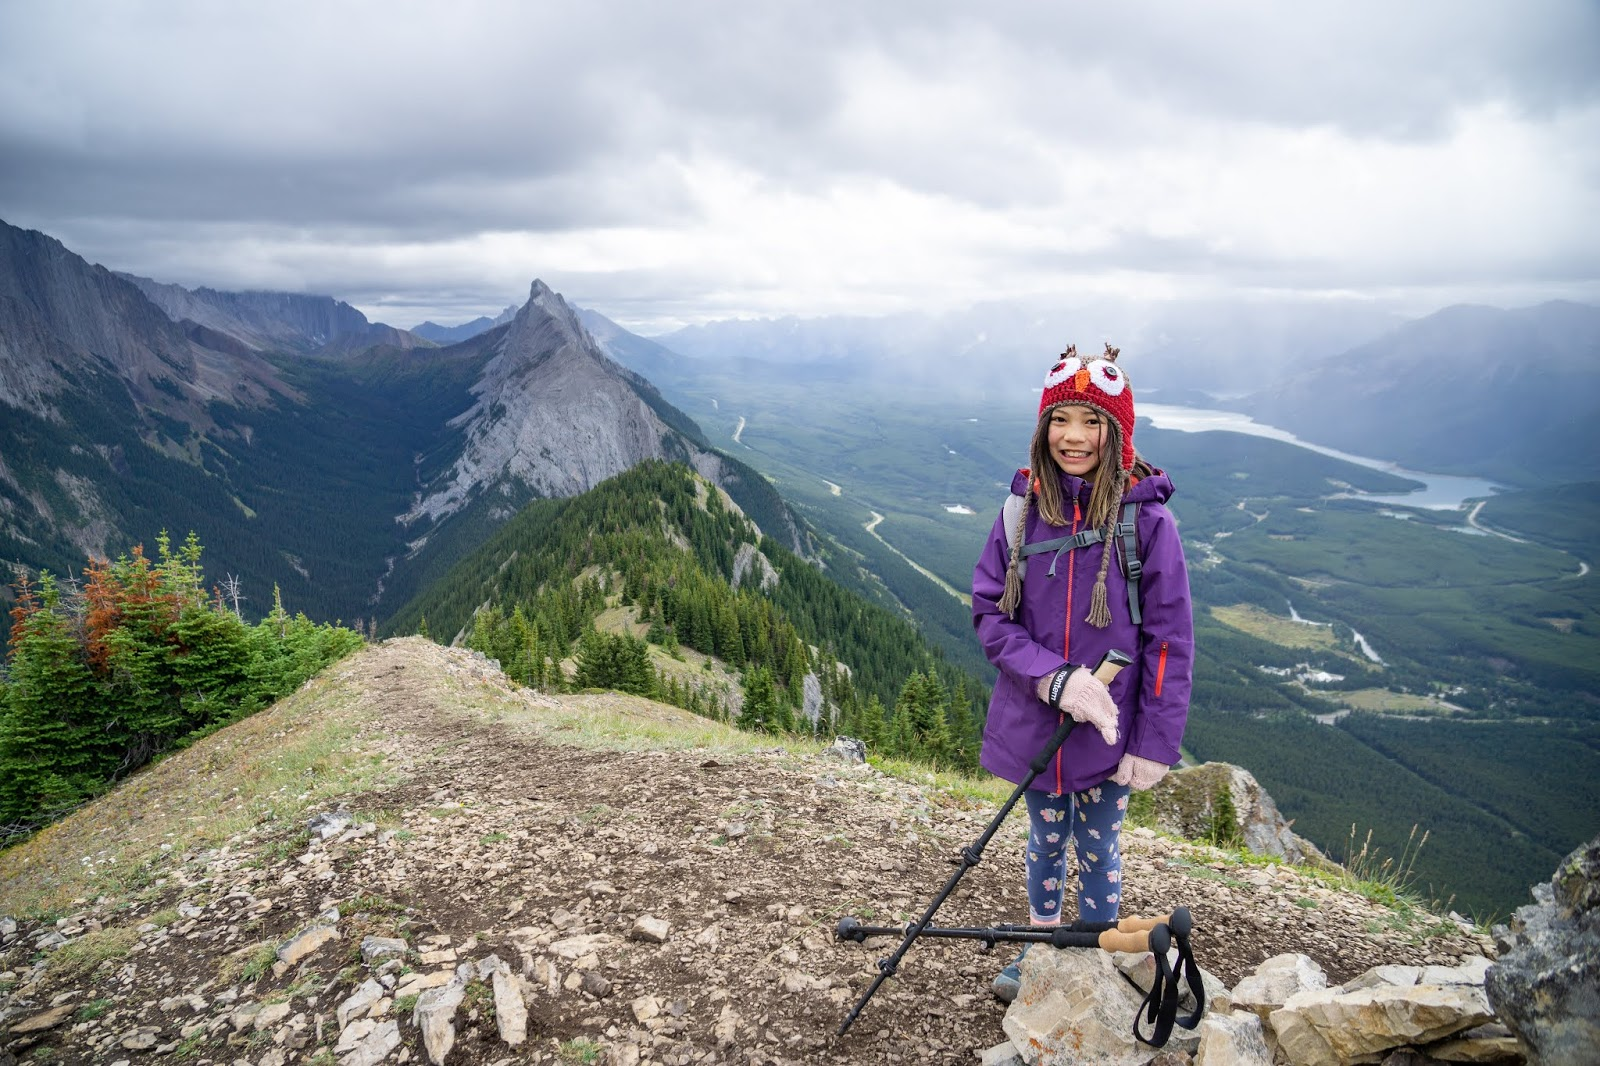 King Creek Ridge first/false summit